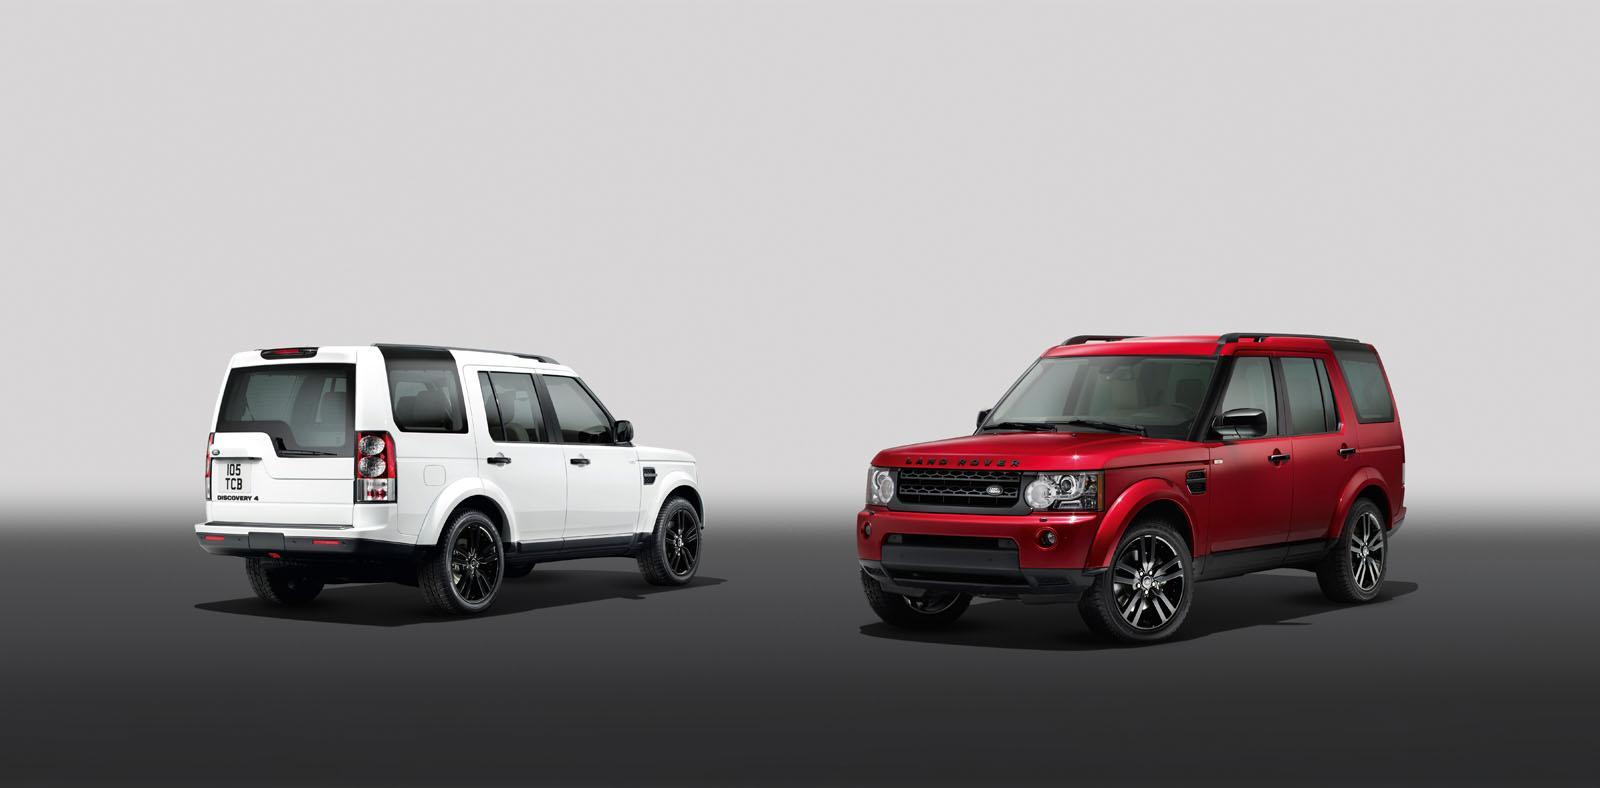 [Resim: Land+Rover+Discovery+4+1.jpg]